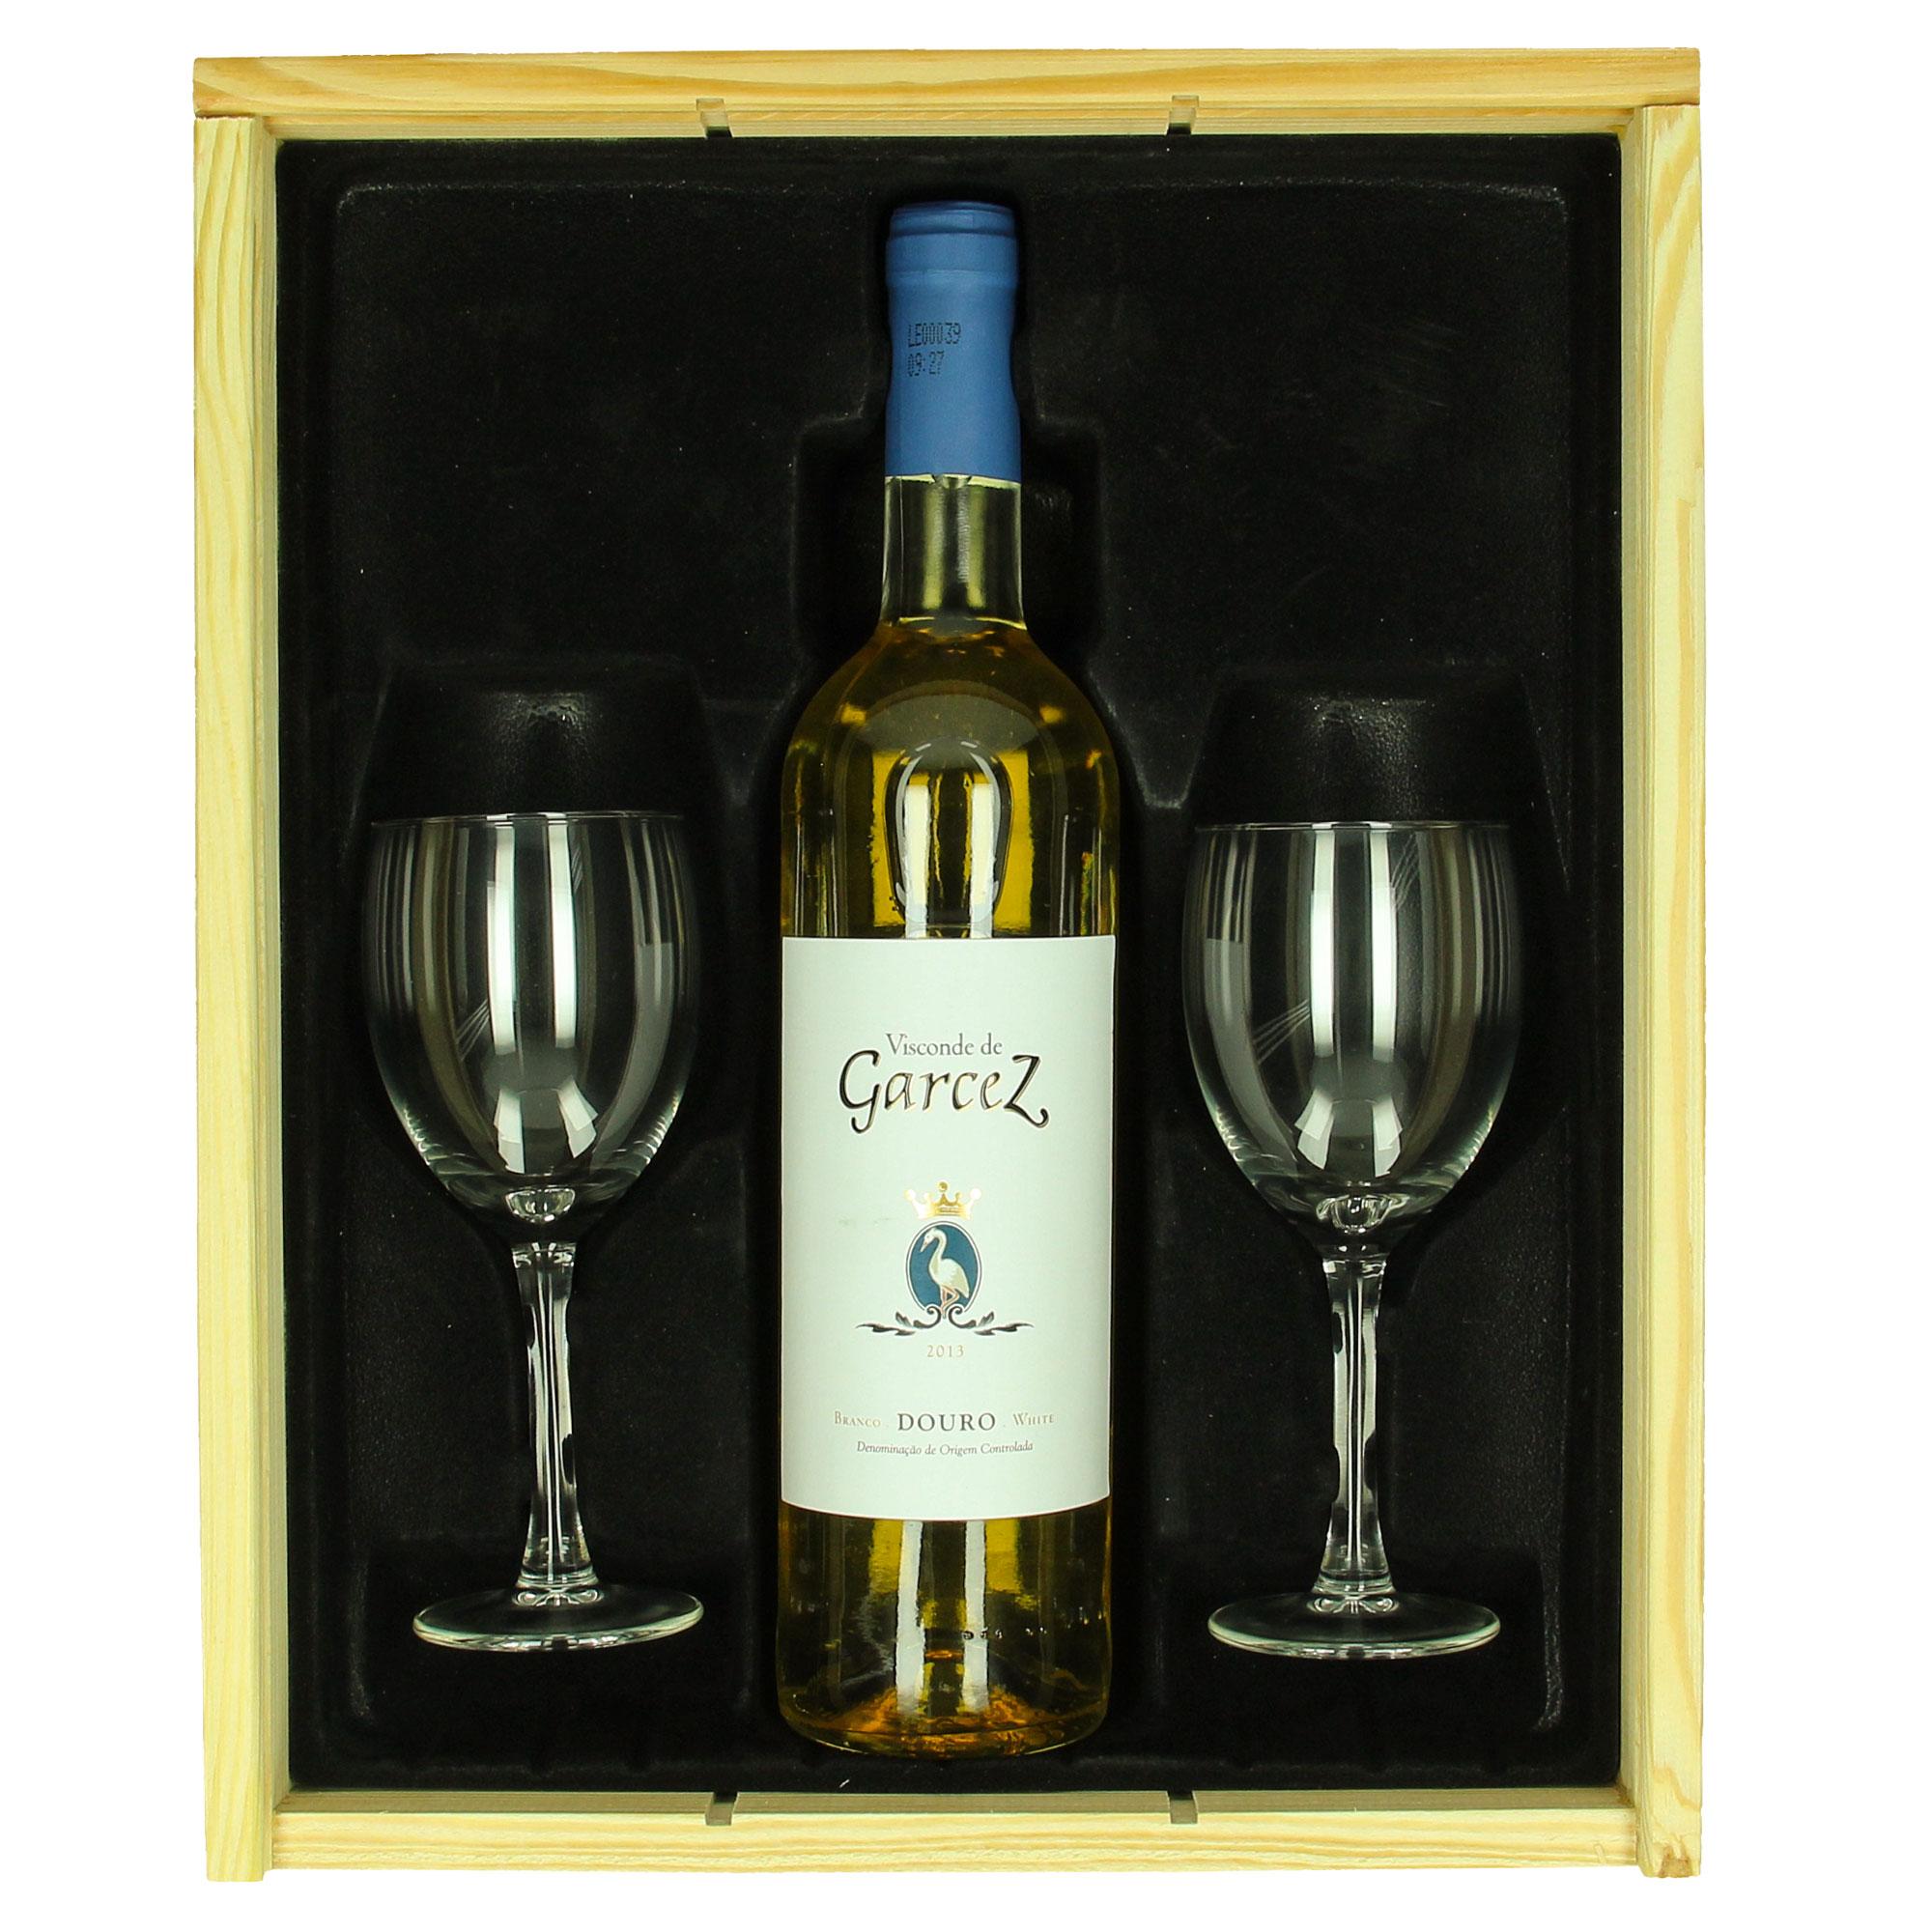 Coffret de vin Visconde de Garcez (blanc) + verres personnalisés